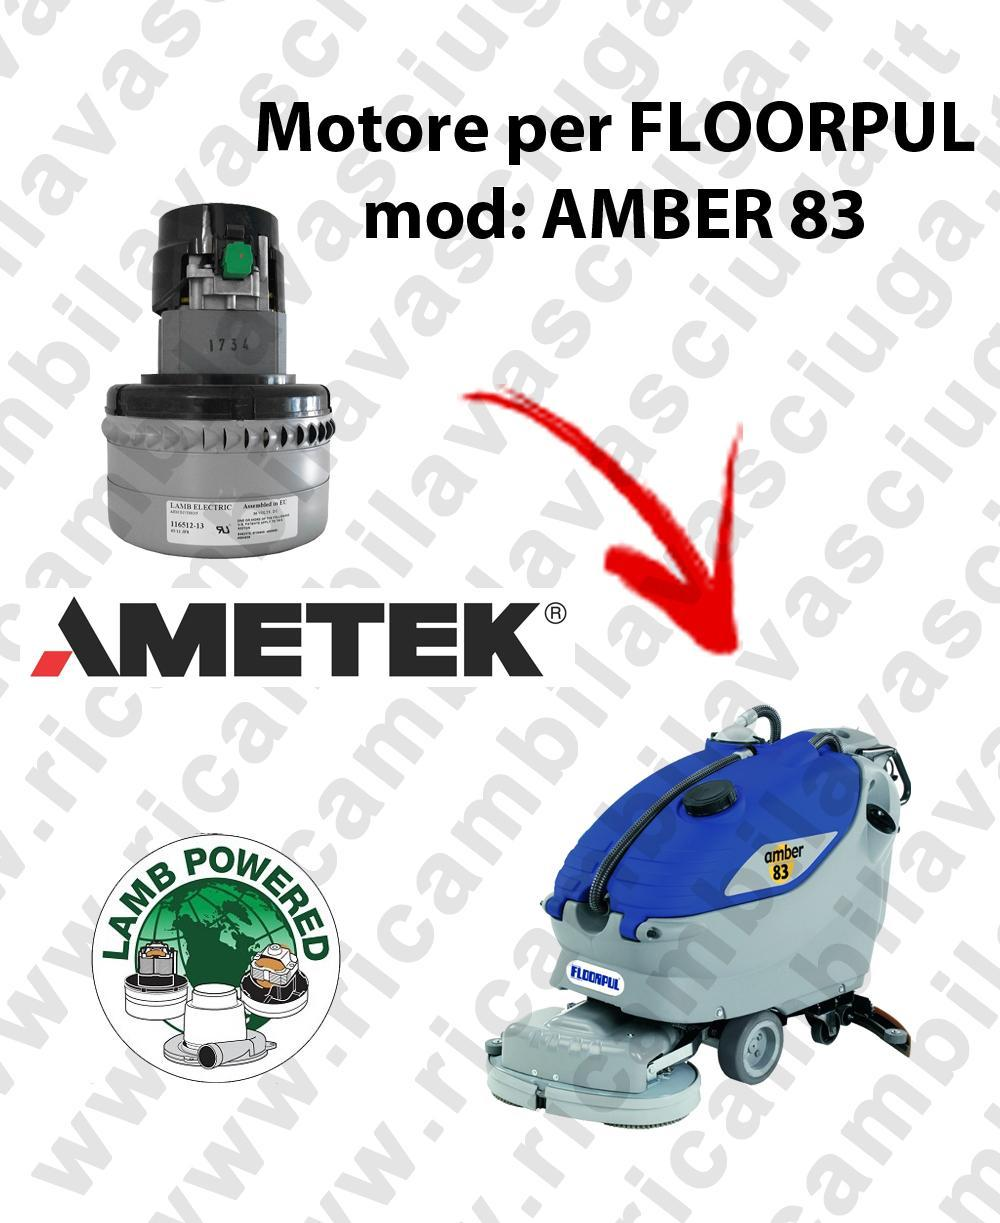 AMBER 83 Motore de aspiración LAMB AMETEK para fregadora FLOORPUL